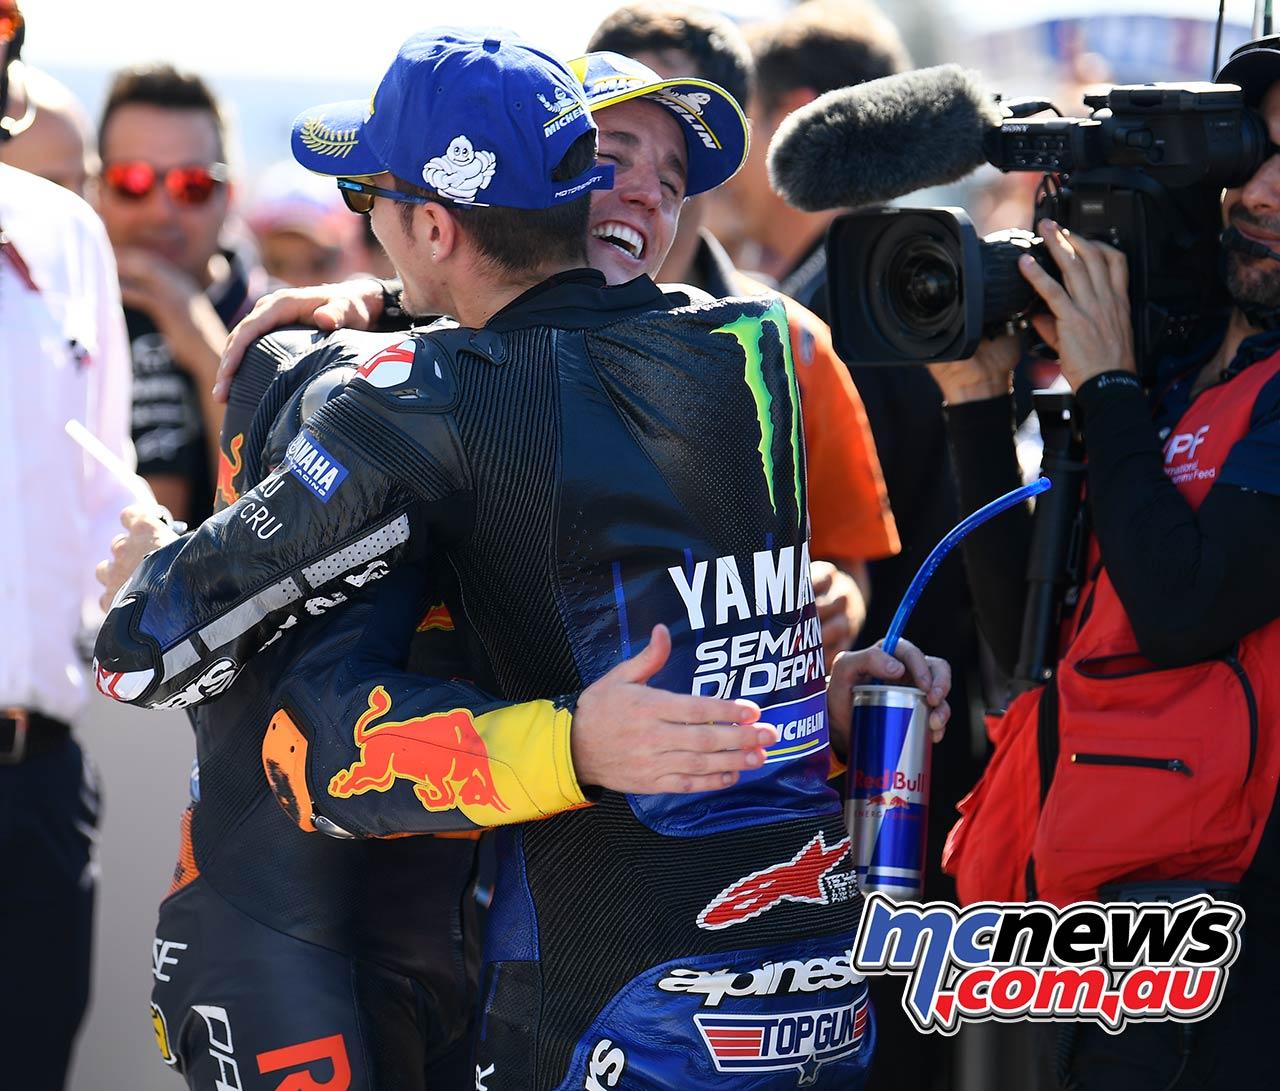 MotoGP Rnd Misano QP Pol Espargaro Vinales